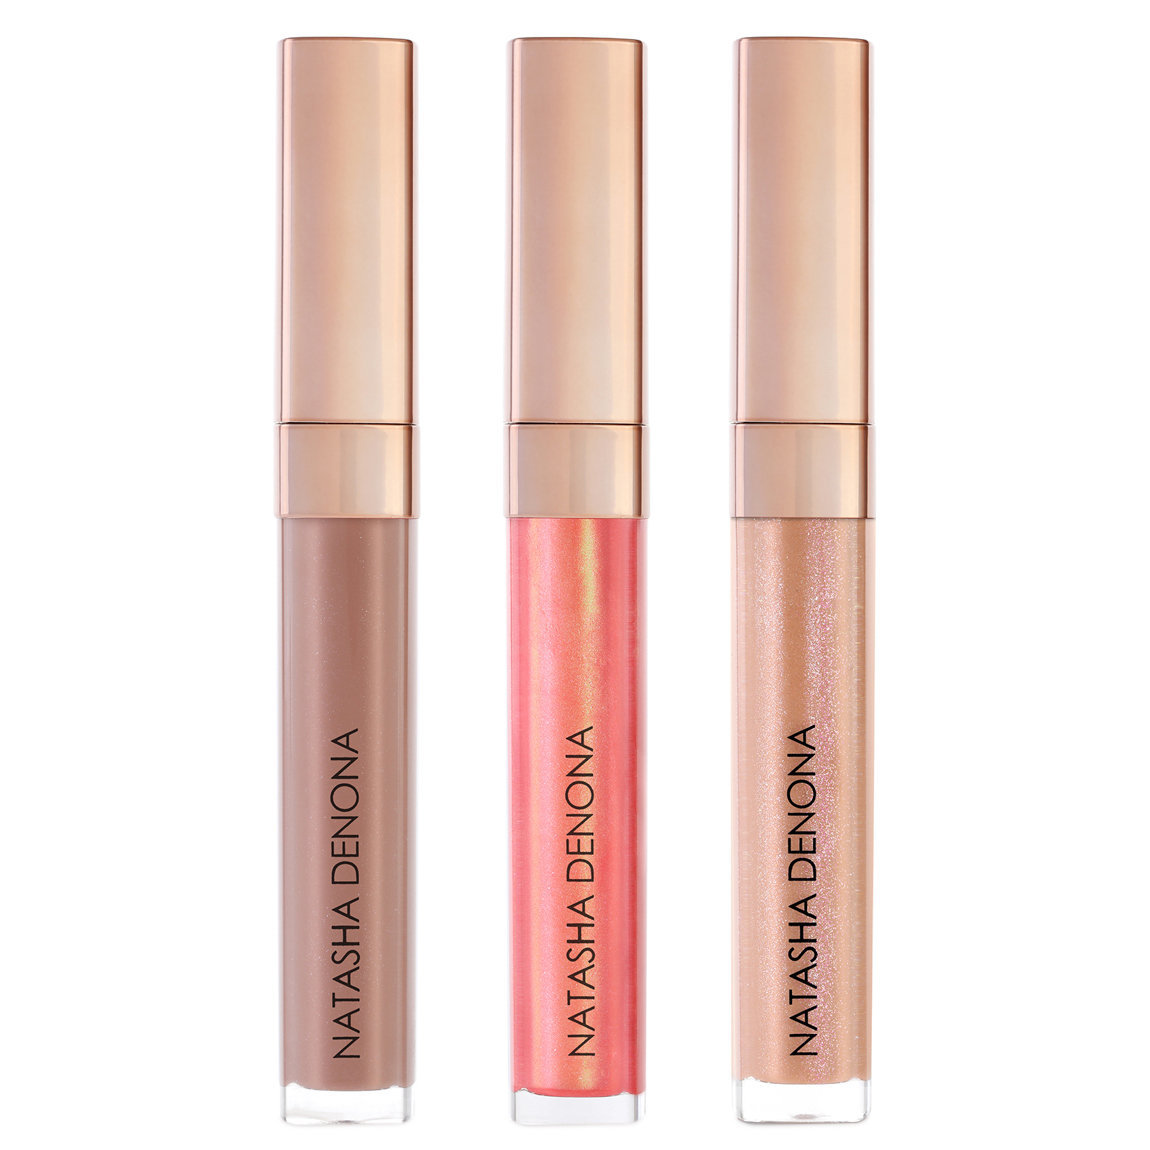 Natasha Denona Lip Oh-Phoria Gloss & Balm Bundle product swatch.